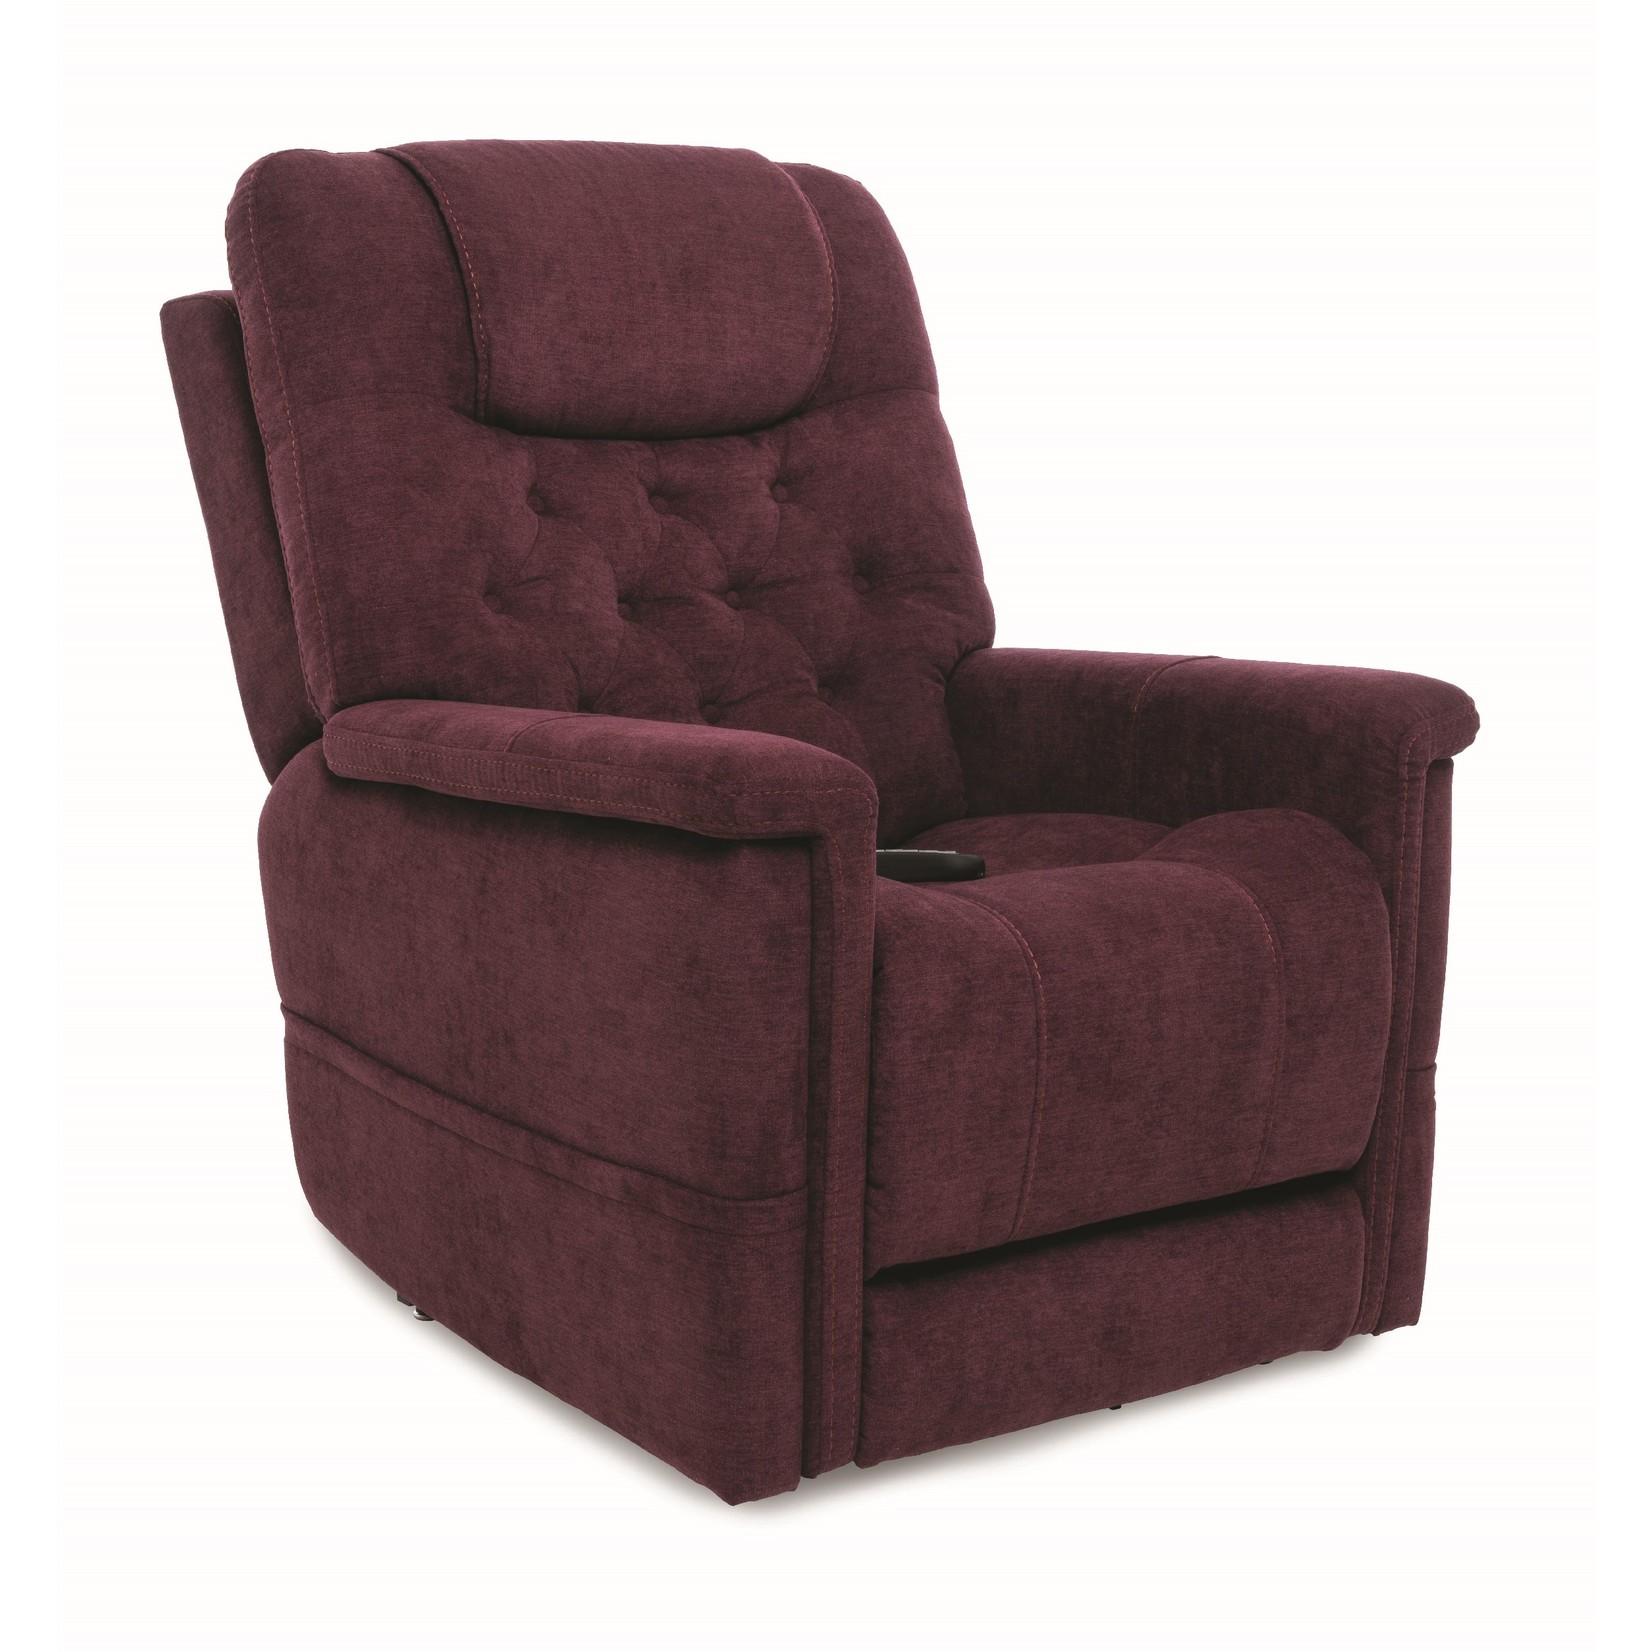 Pride Legacy Lift Chair